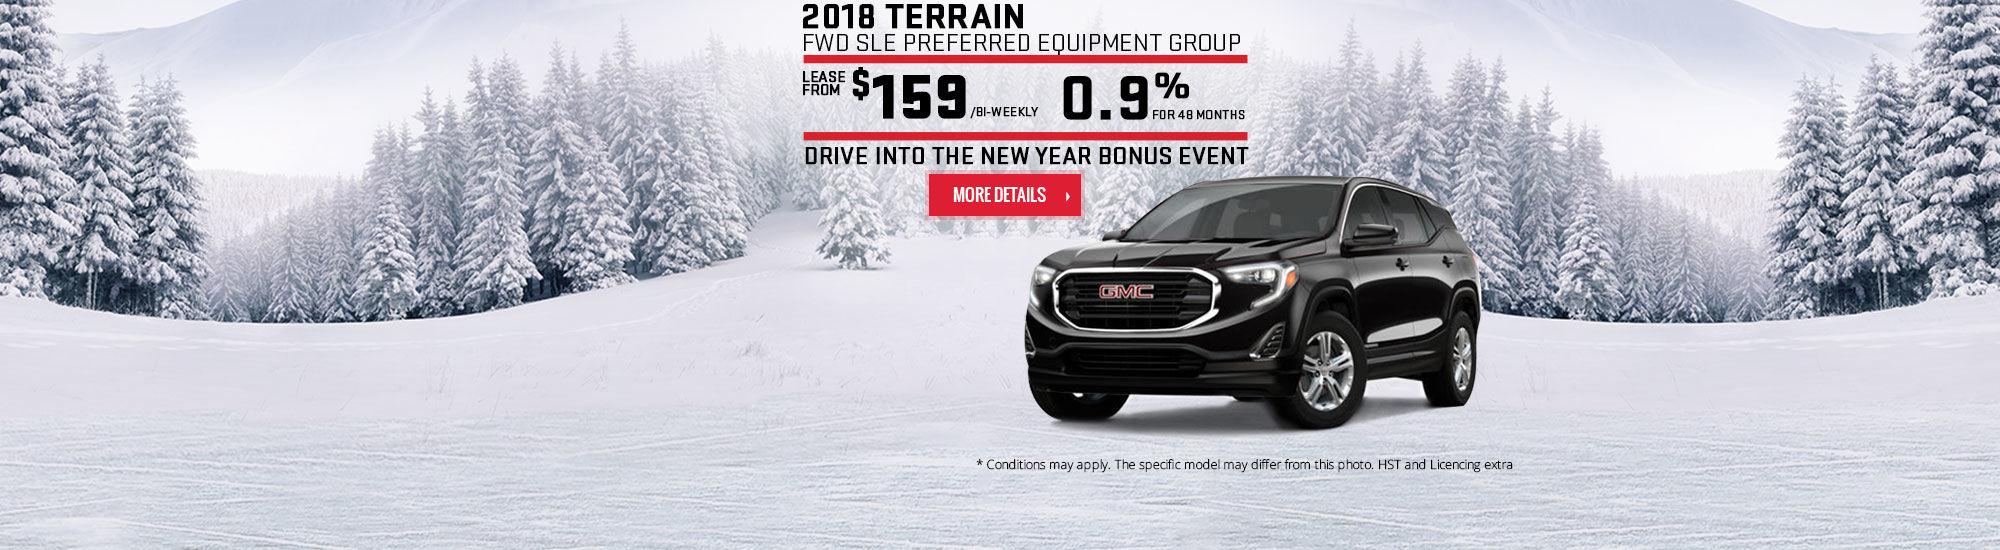 Drive Into the New Year Bonus Event - GMC - Terrain